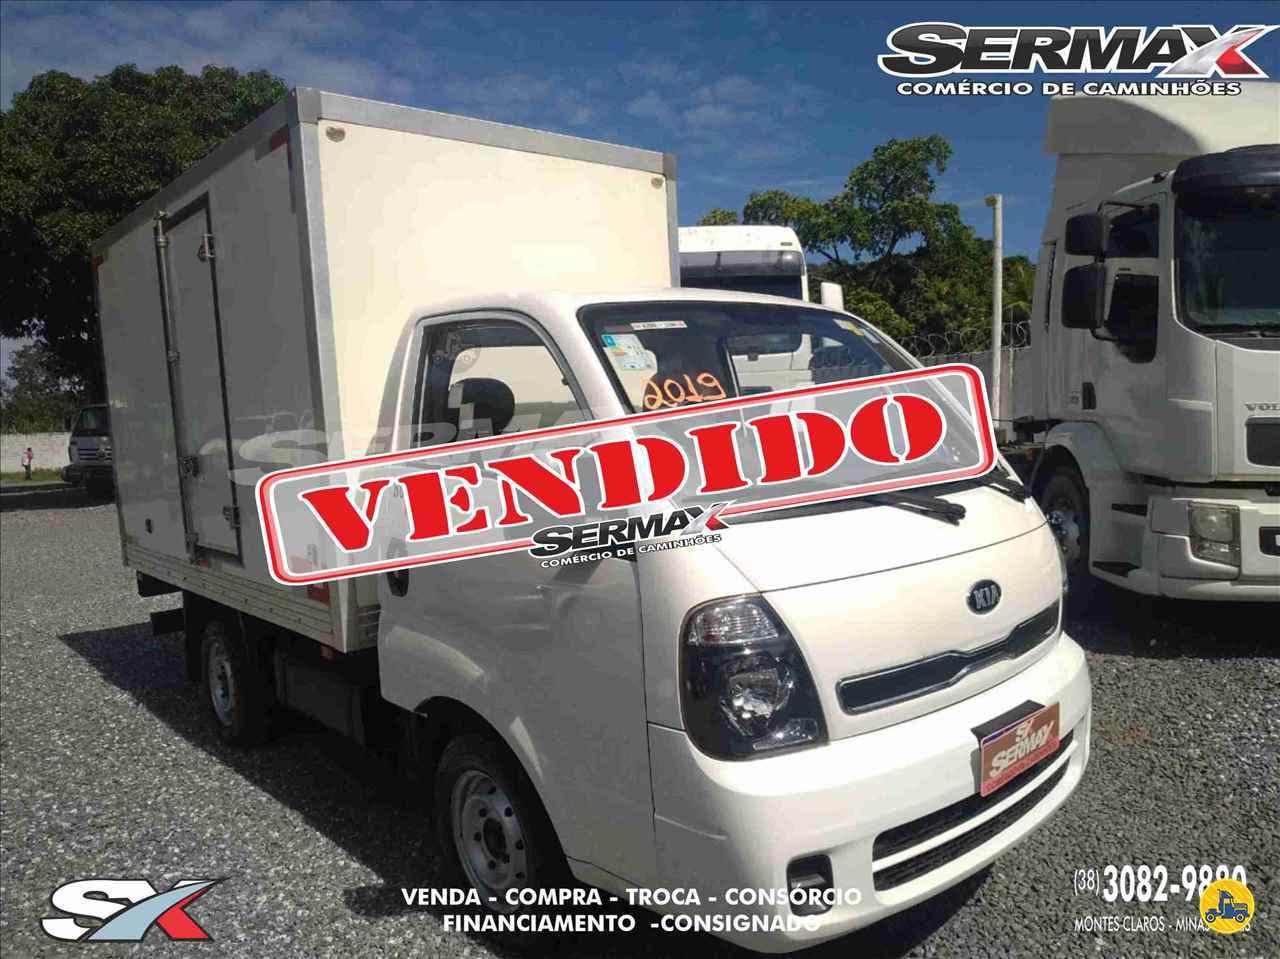 UTILITARIOS KIA MOTORS Bongo K-2500 Sermax Caminhões MONTES CLAROS MINAS GERAIS MG